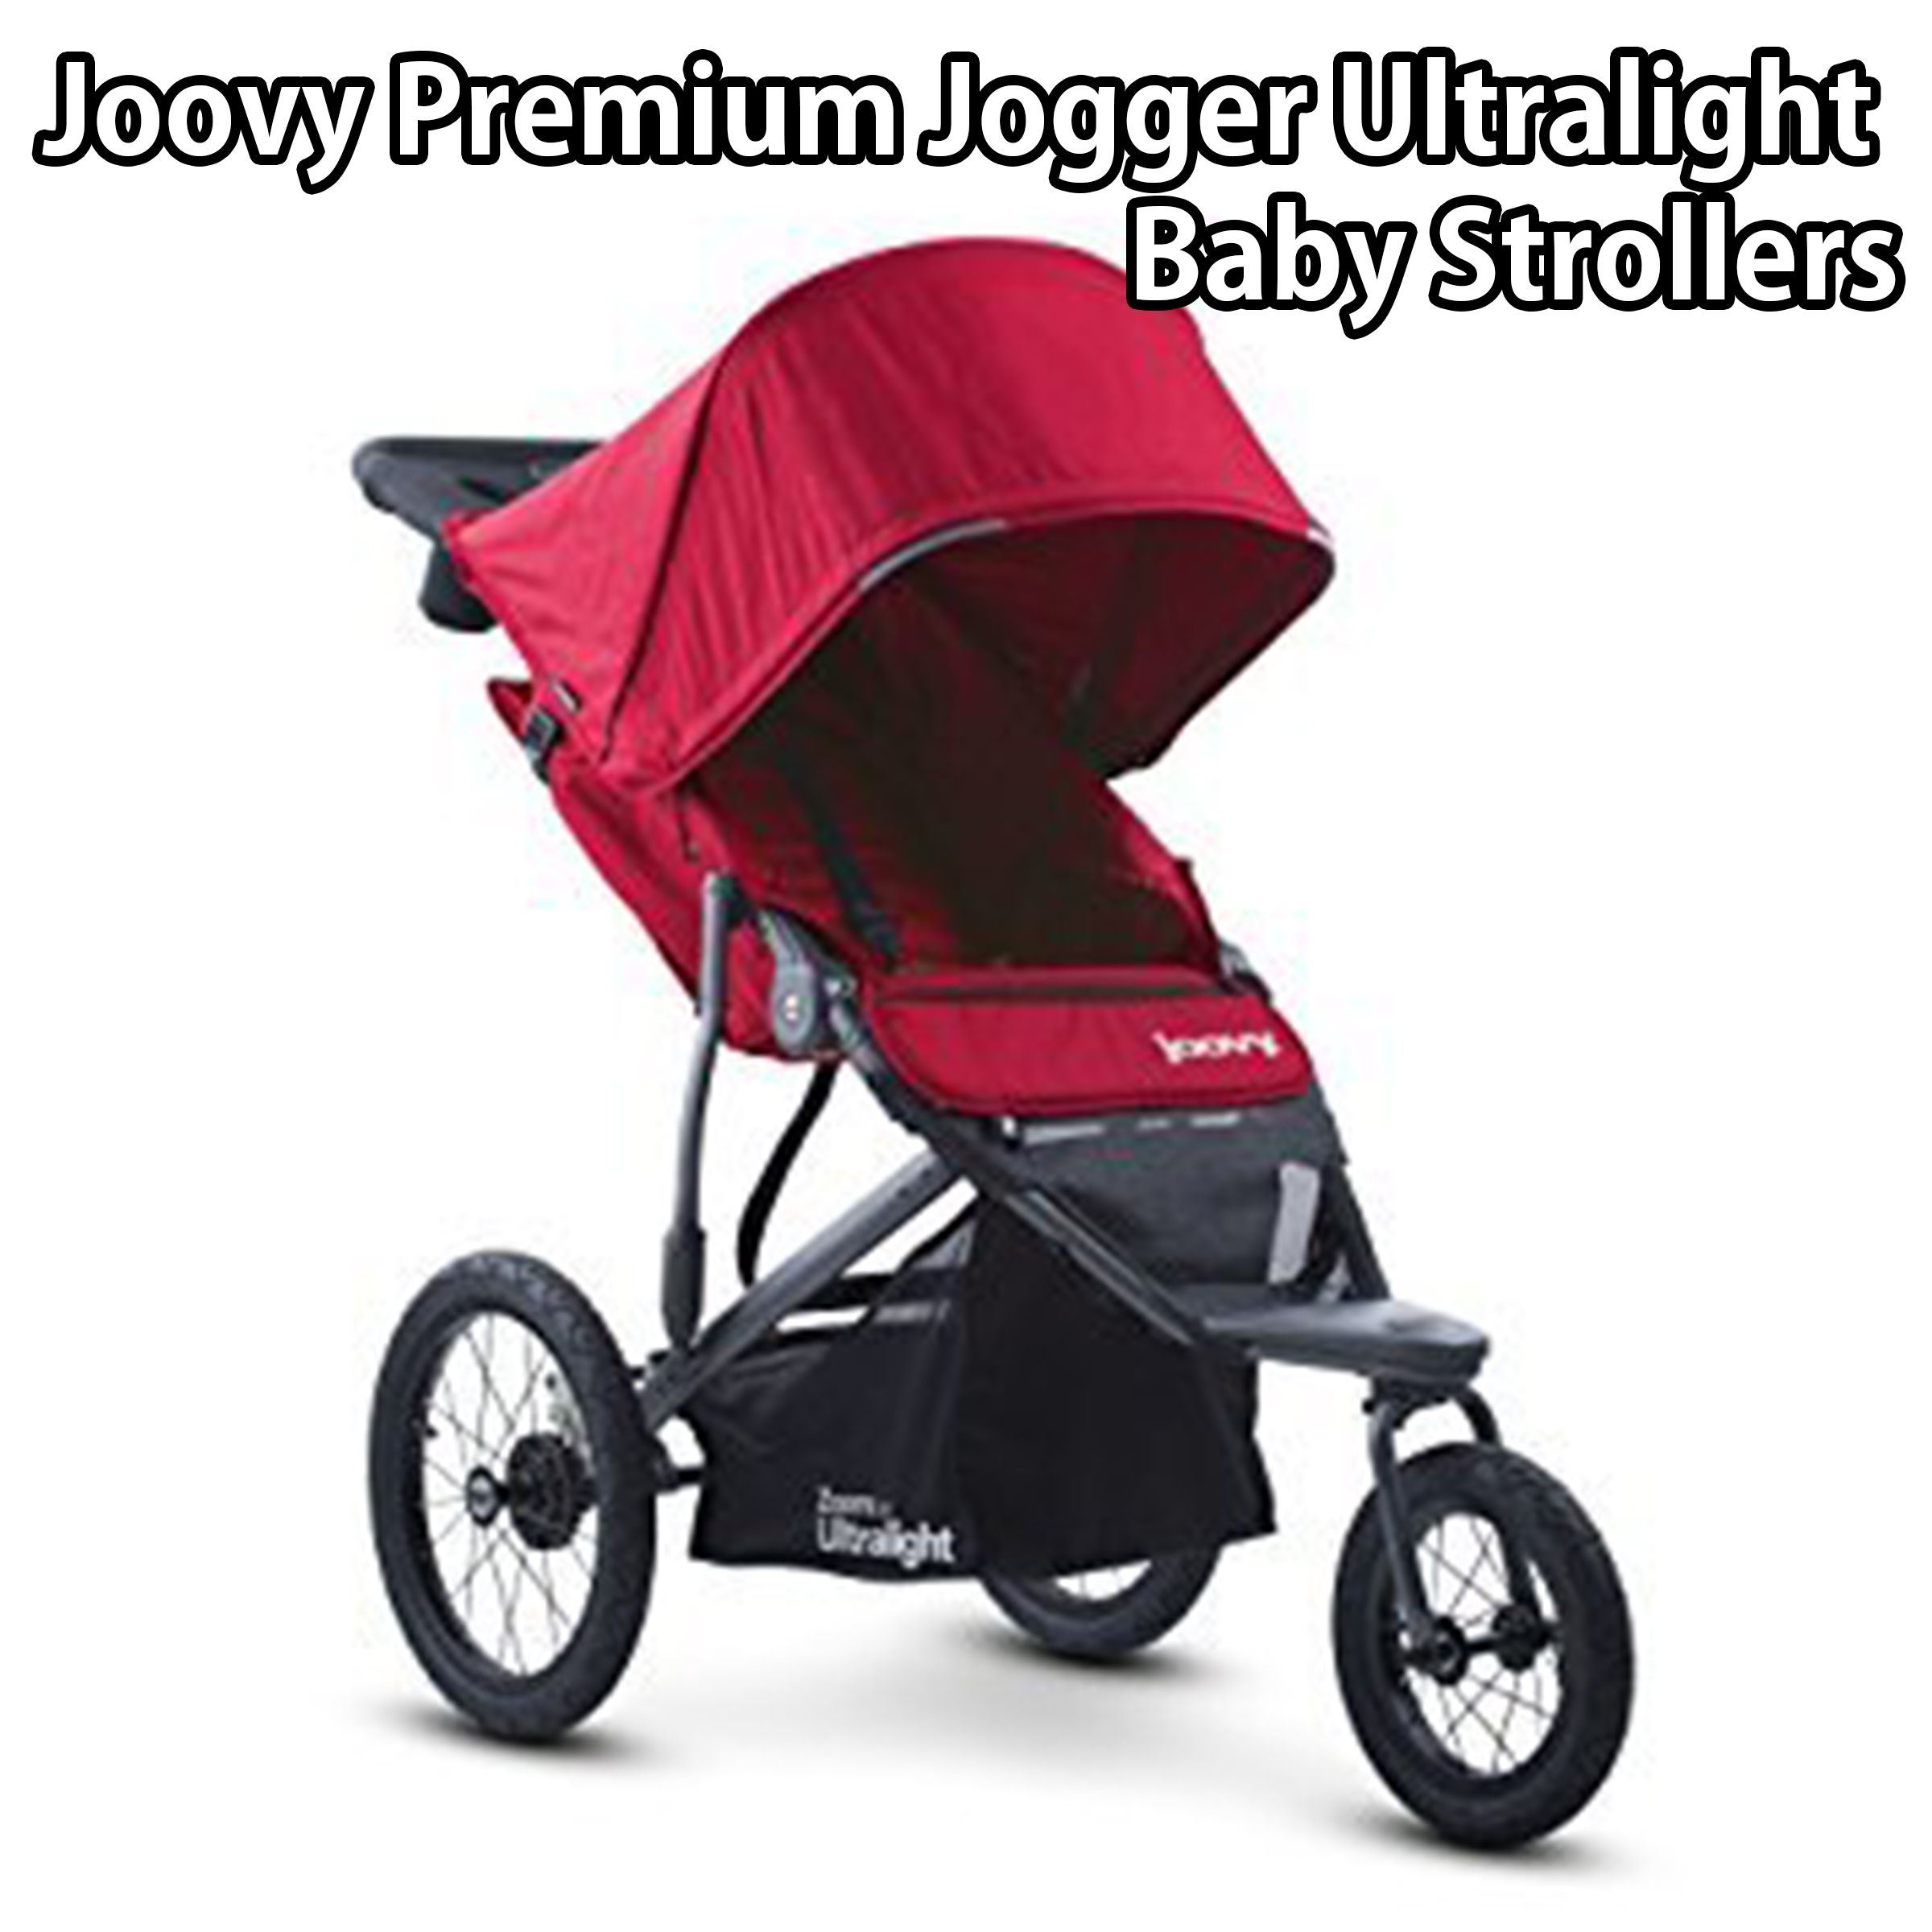 Joovy Premium Jogger Ultralight Baby Strollers https